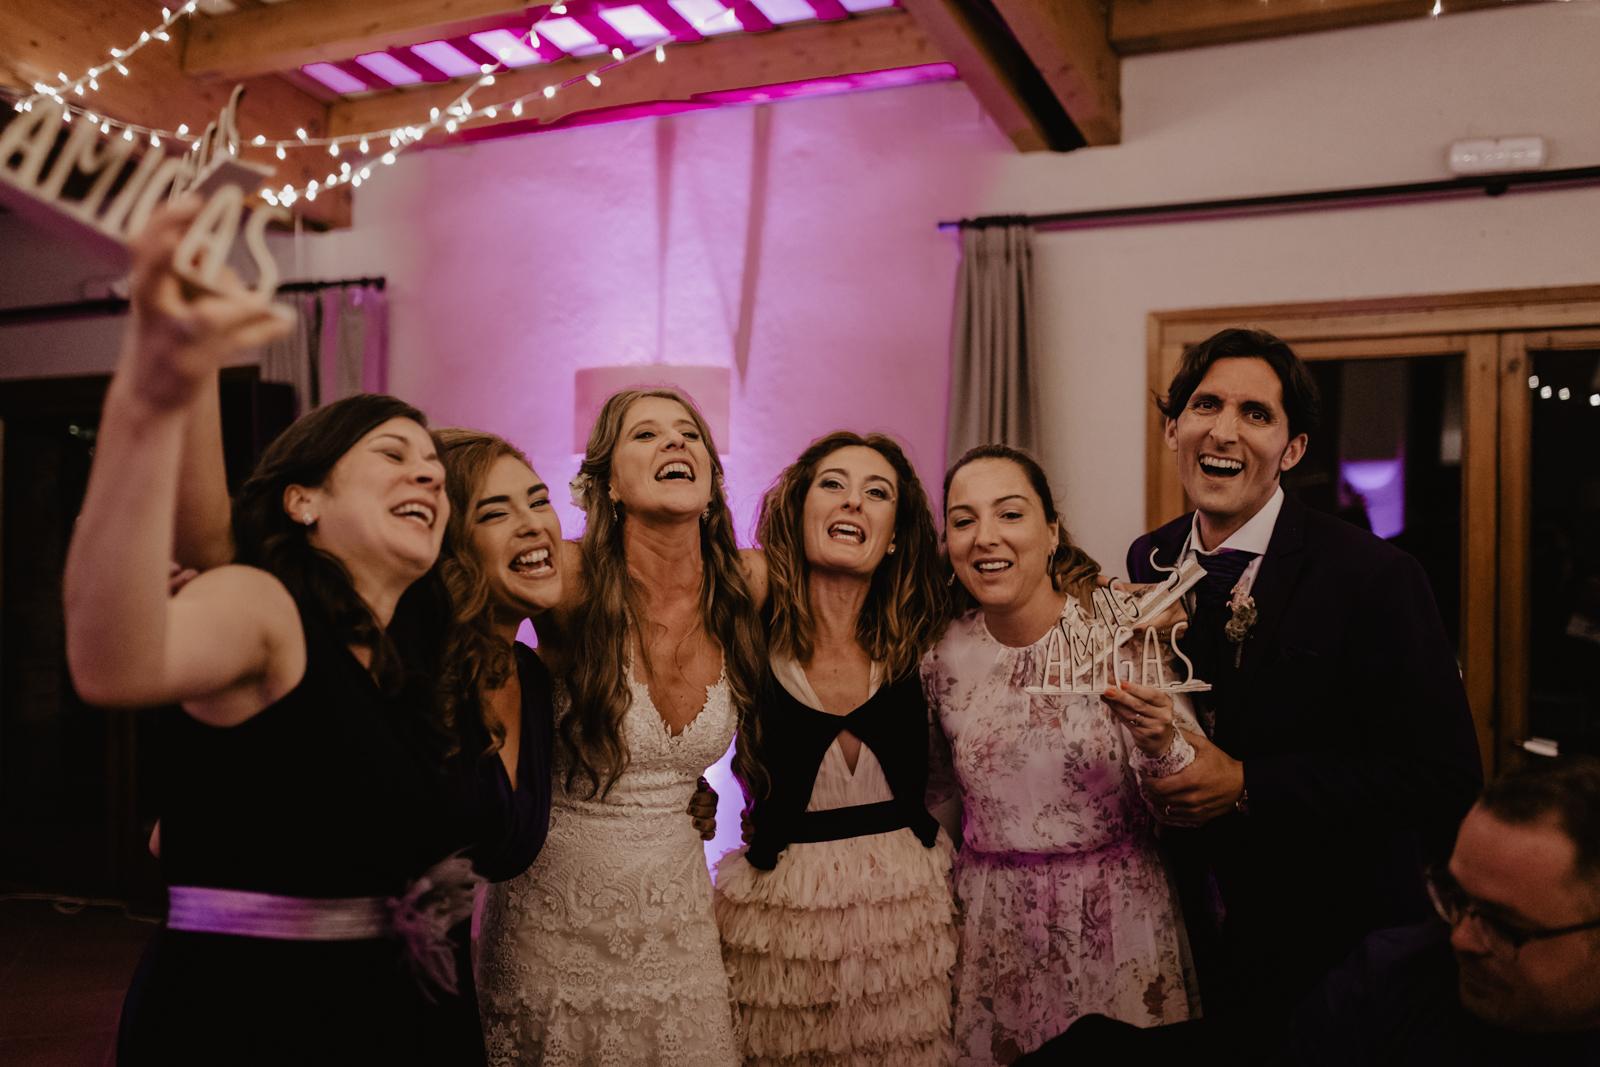 thenortherngirlphotography_photography_thenortherngirl_rebeccascabros_wedding_weddingphotography_weddingphotographer_barcelona_bodaenbarcelona_bodaenmaselmarti_bodarogeryvane-858.jpg